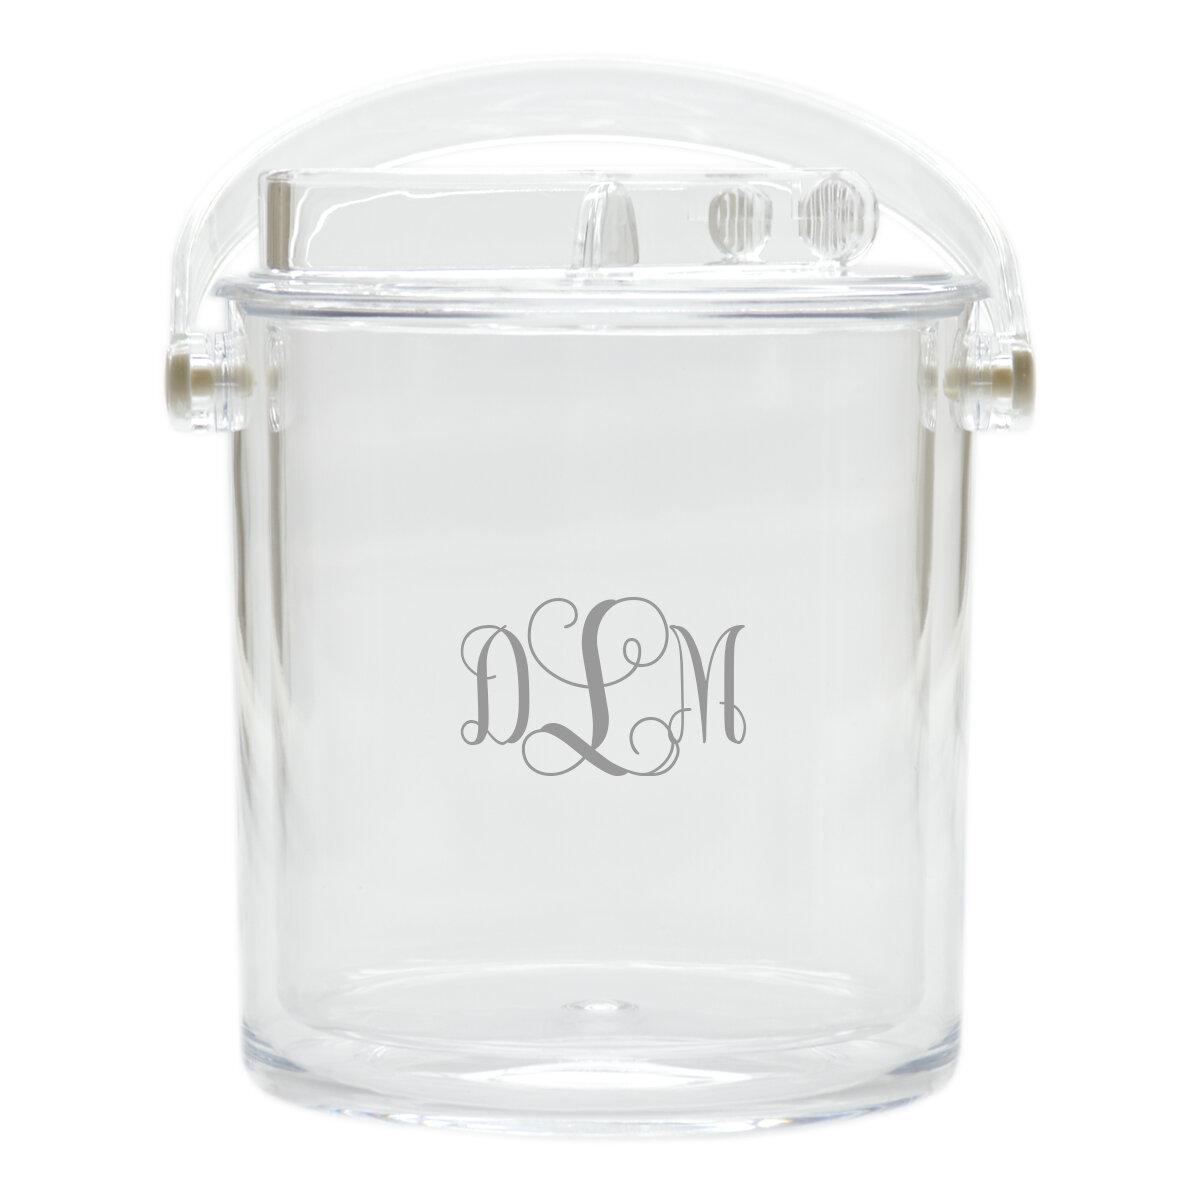 Monogrammed Acrylic Ice Bucket w Scoop